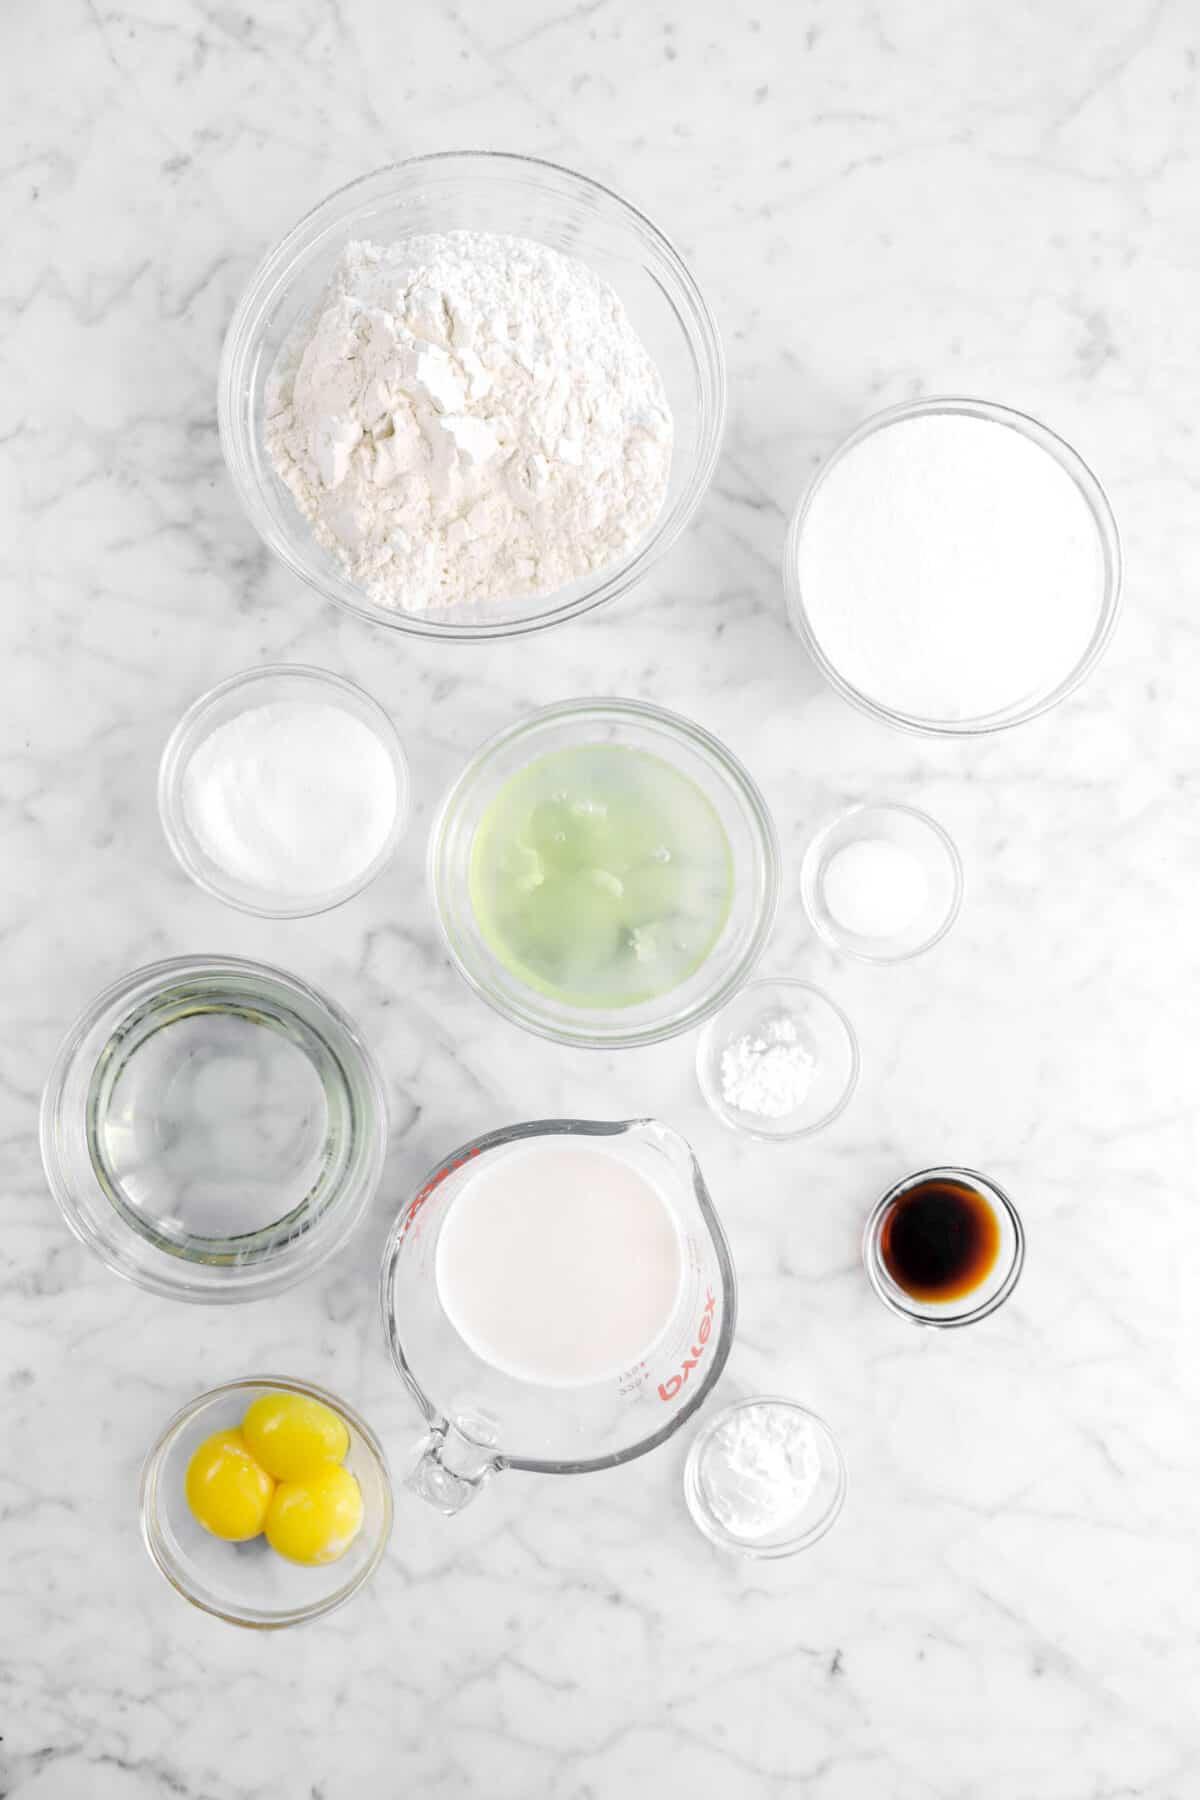 flour, sugar, egg whites, salt, cream of tar tar, vegetable oil, milk, vanilla, baking powder, and egg yolks in glass bowls